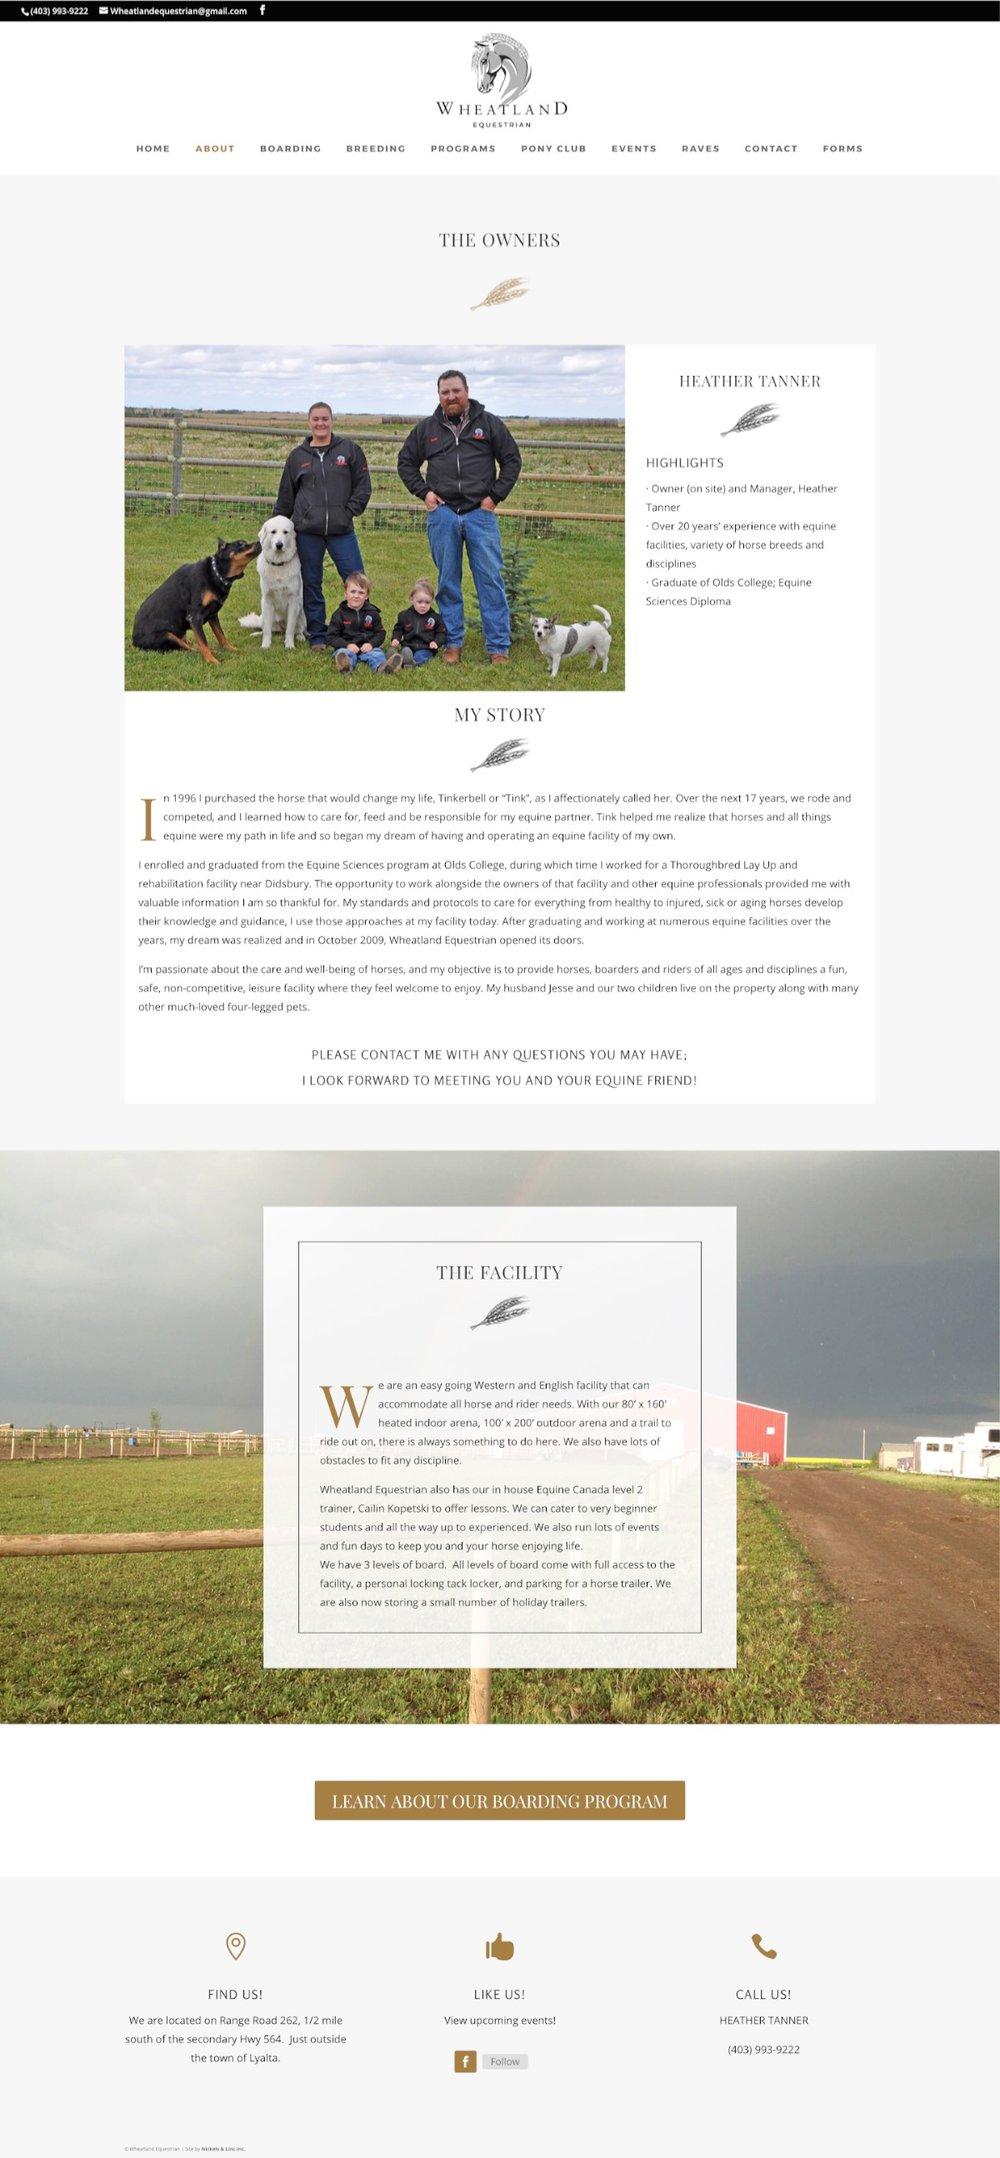 okotoks-horse-boarding-website-about-1.jpg